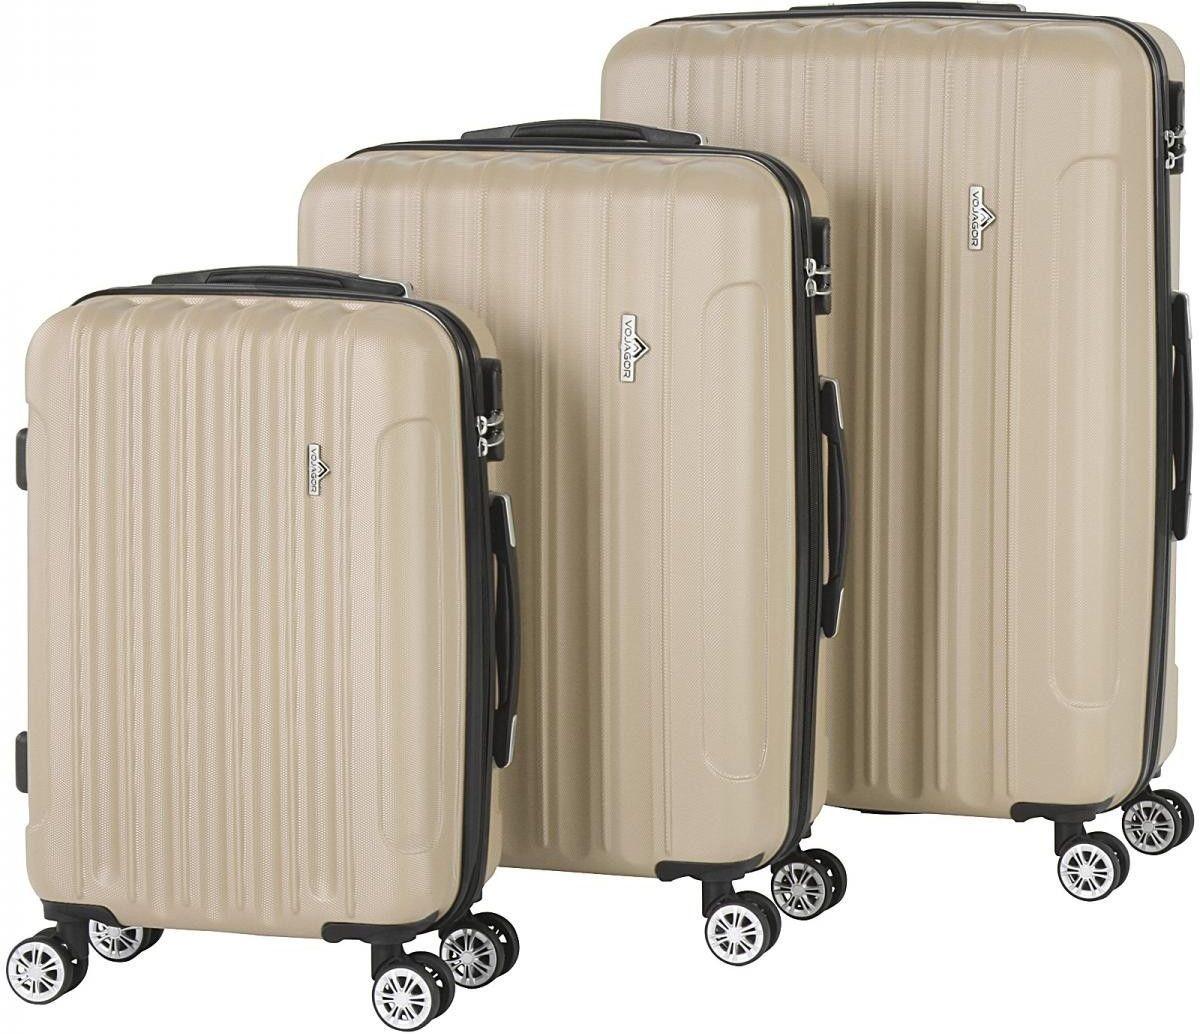 Kofferset, trolleyset, champagne, set van 3, 33-65-90 liter, hardschalen koffers, cijferslot, rolkoffers kopen